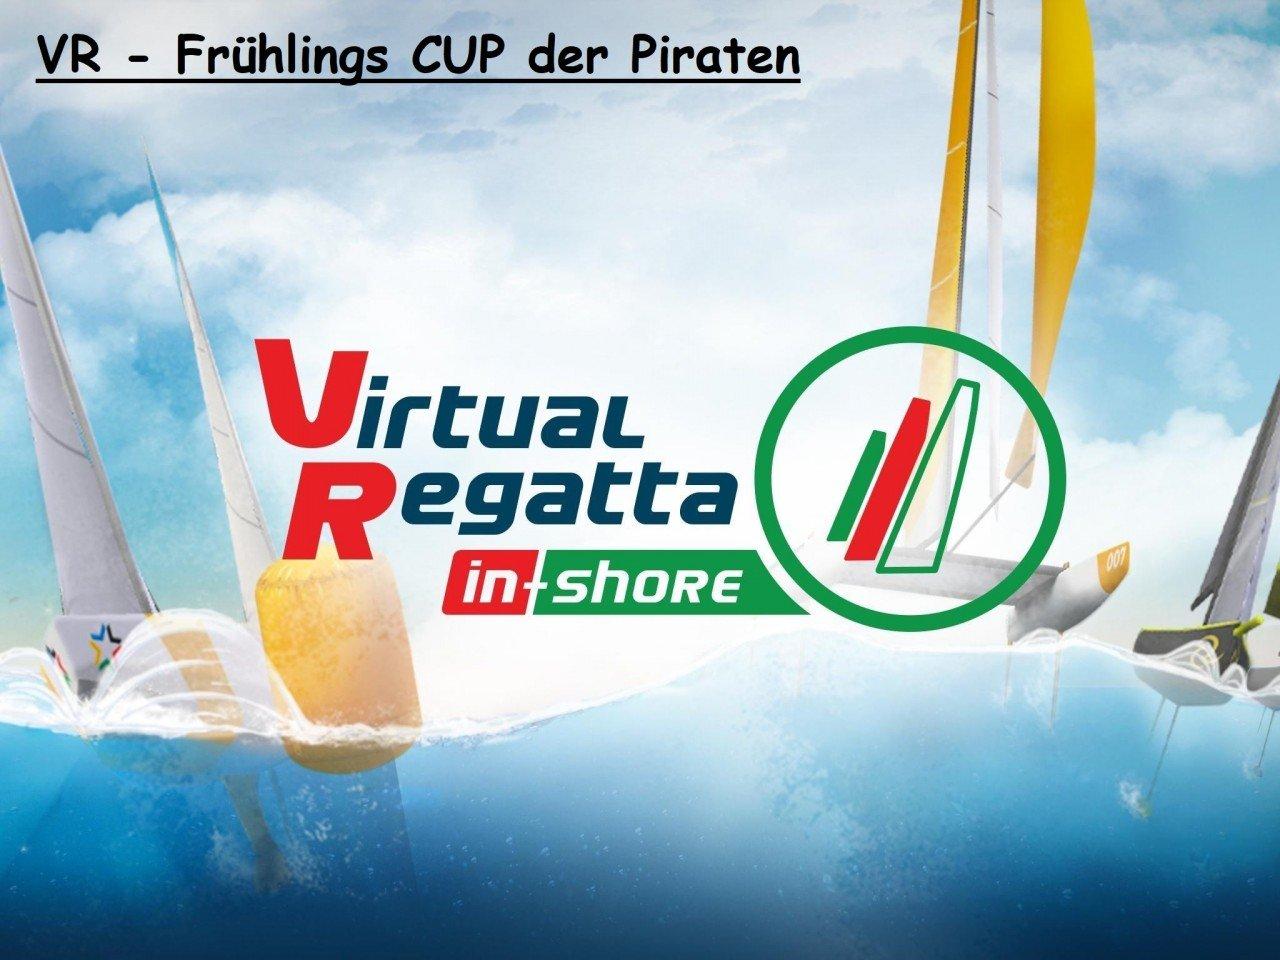 VR – Frühlings CUP der Piraten